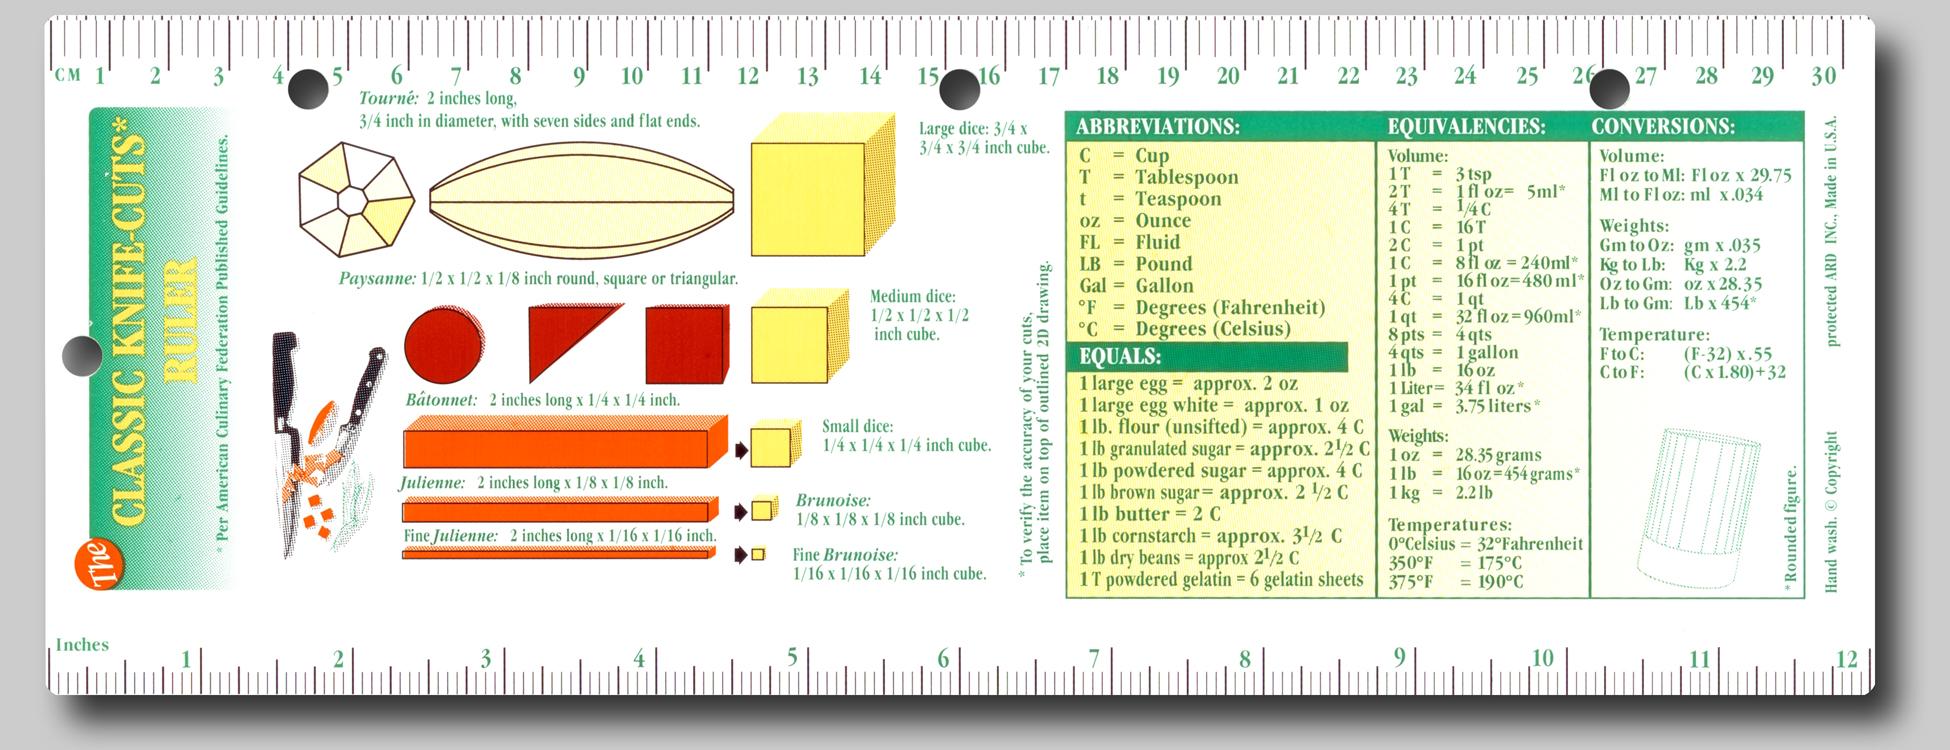 Culinary Knife Cuts Chart Ofertasvuelo